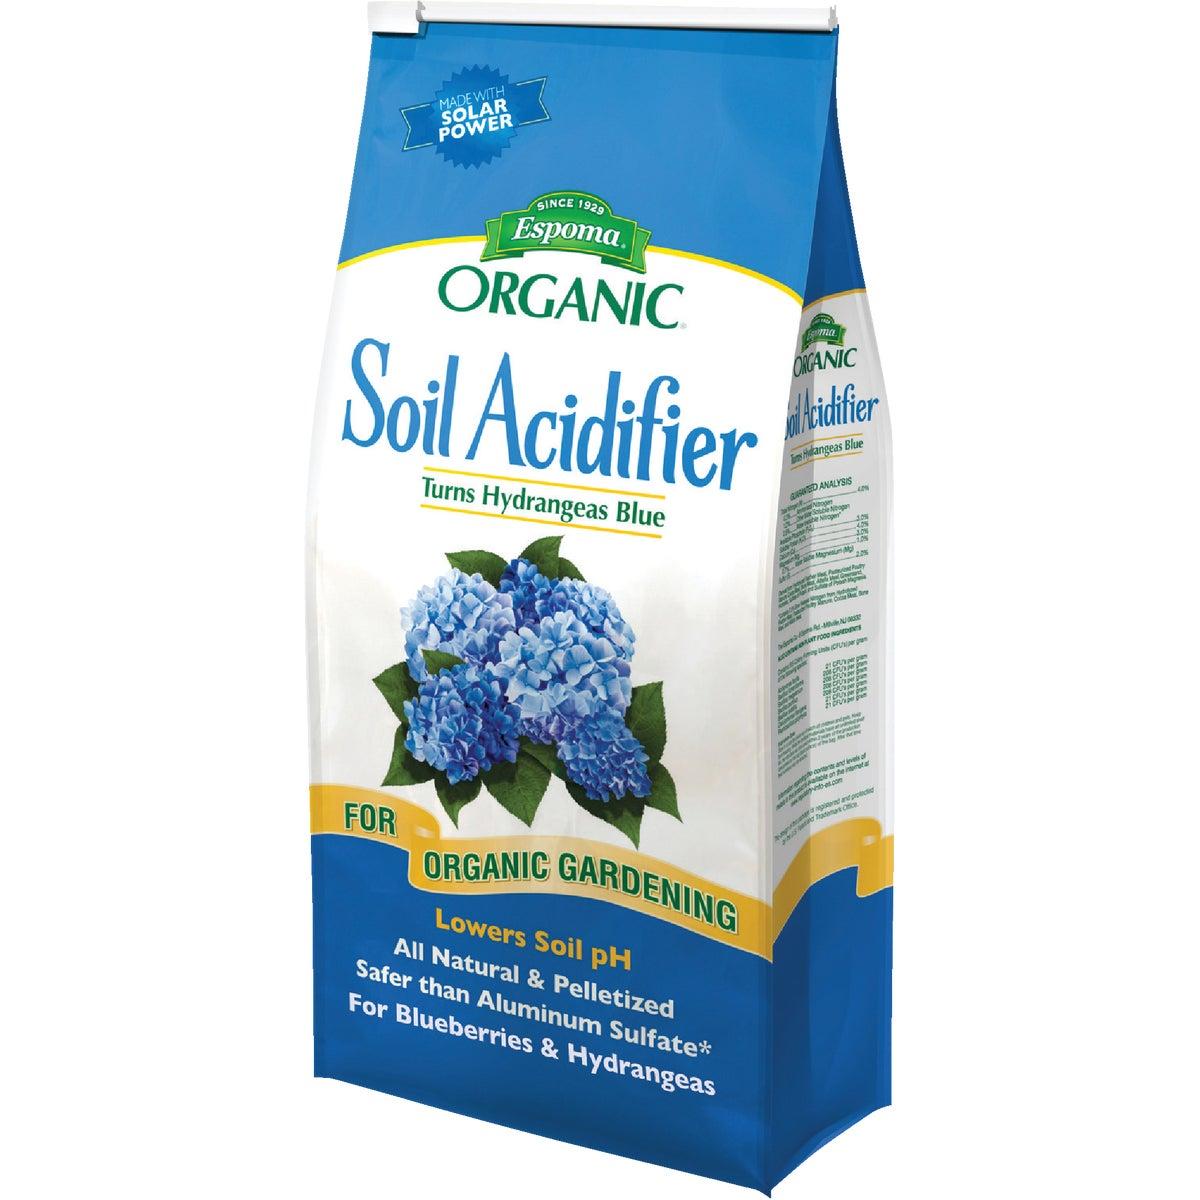 Espoma 5#ORGANIC SOIL ACIDIFIER GSUL5